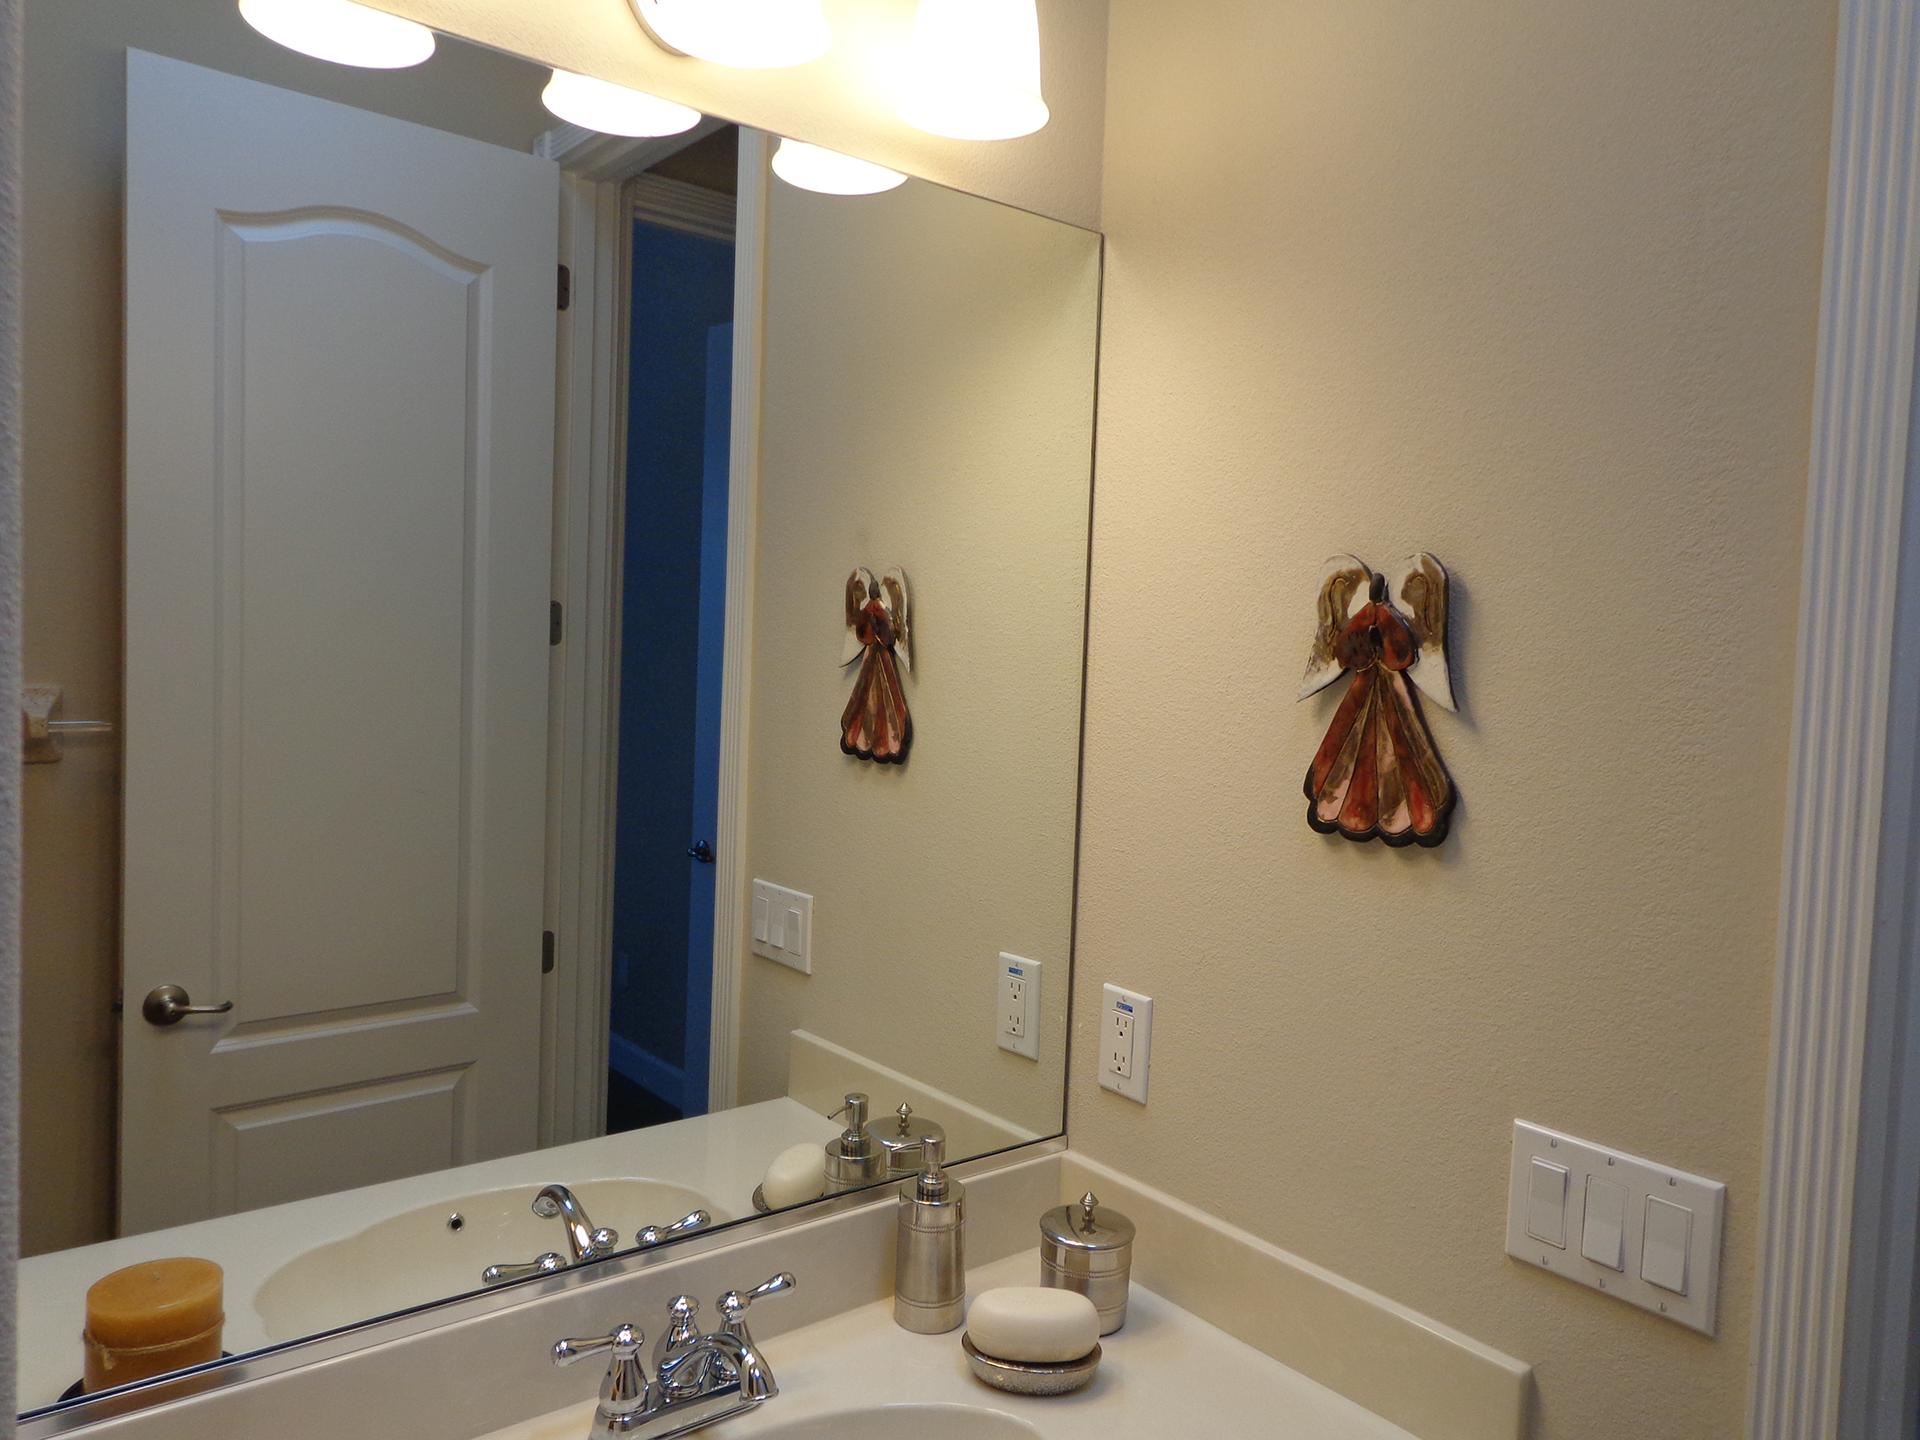 Staged-Assets-Home-Staging-Interior-Design-Palm-Coast-Florida-10